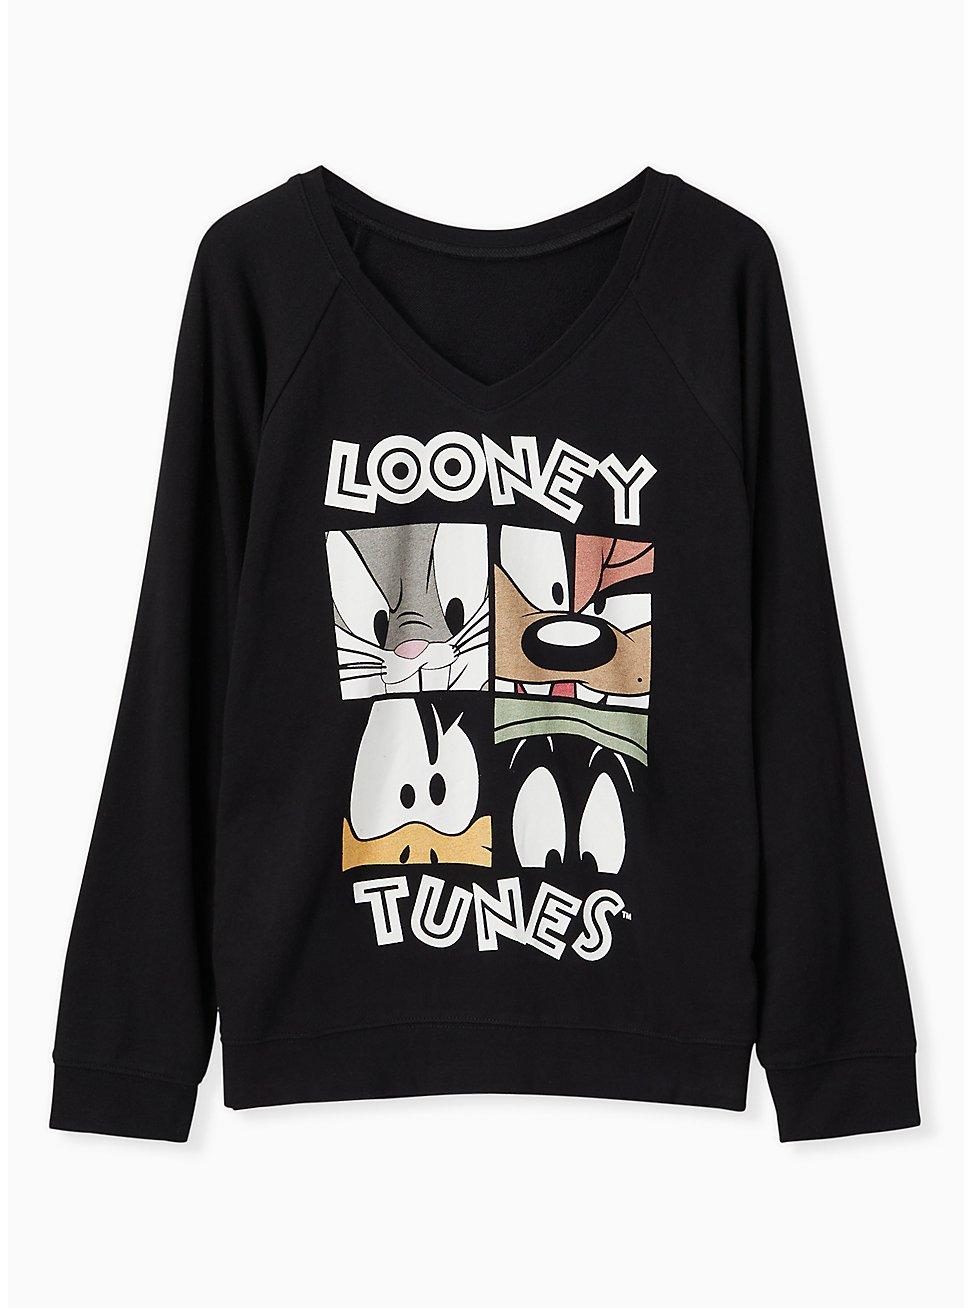 Looney Tunes Characters Black V-Neck Sweatshirt, DEEP BLACK, hi-res